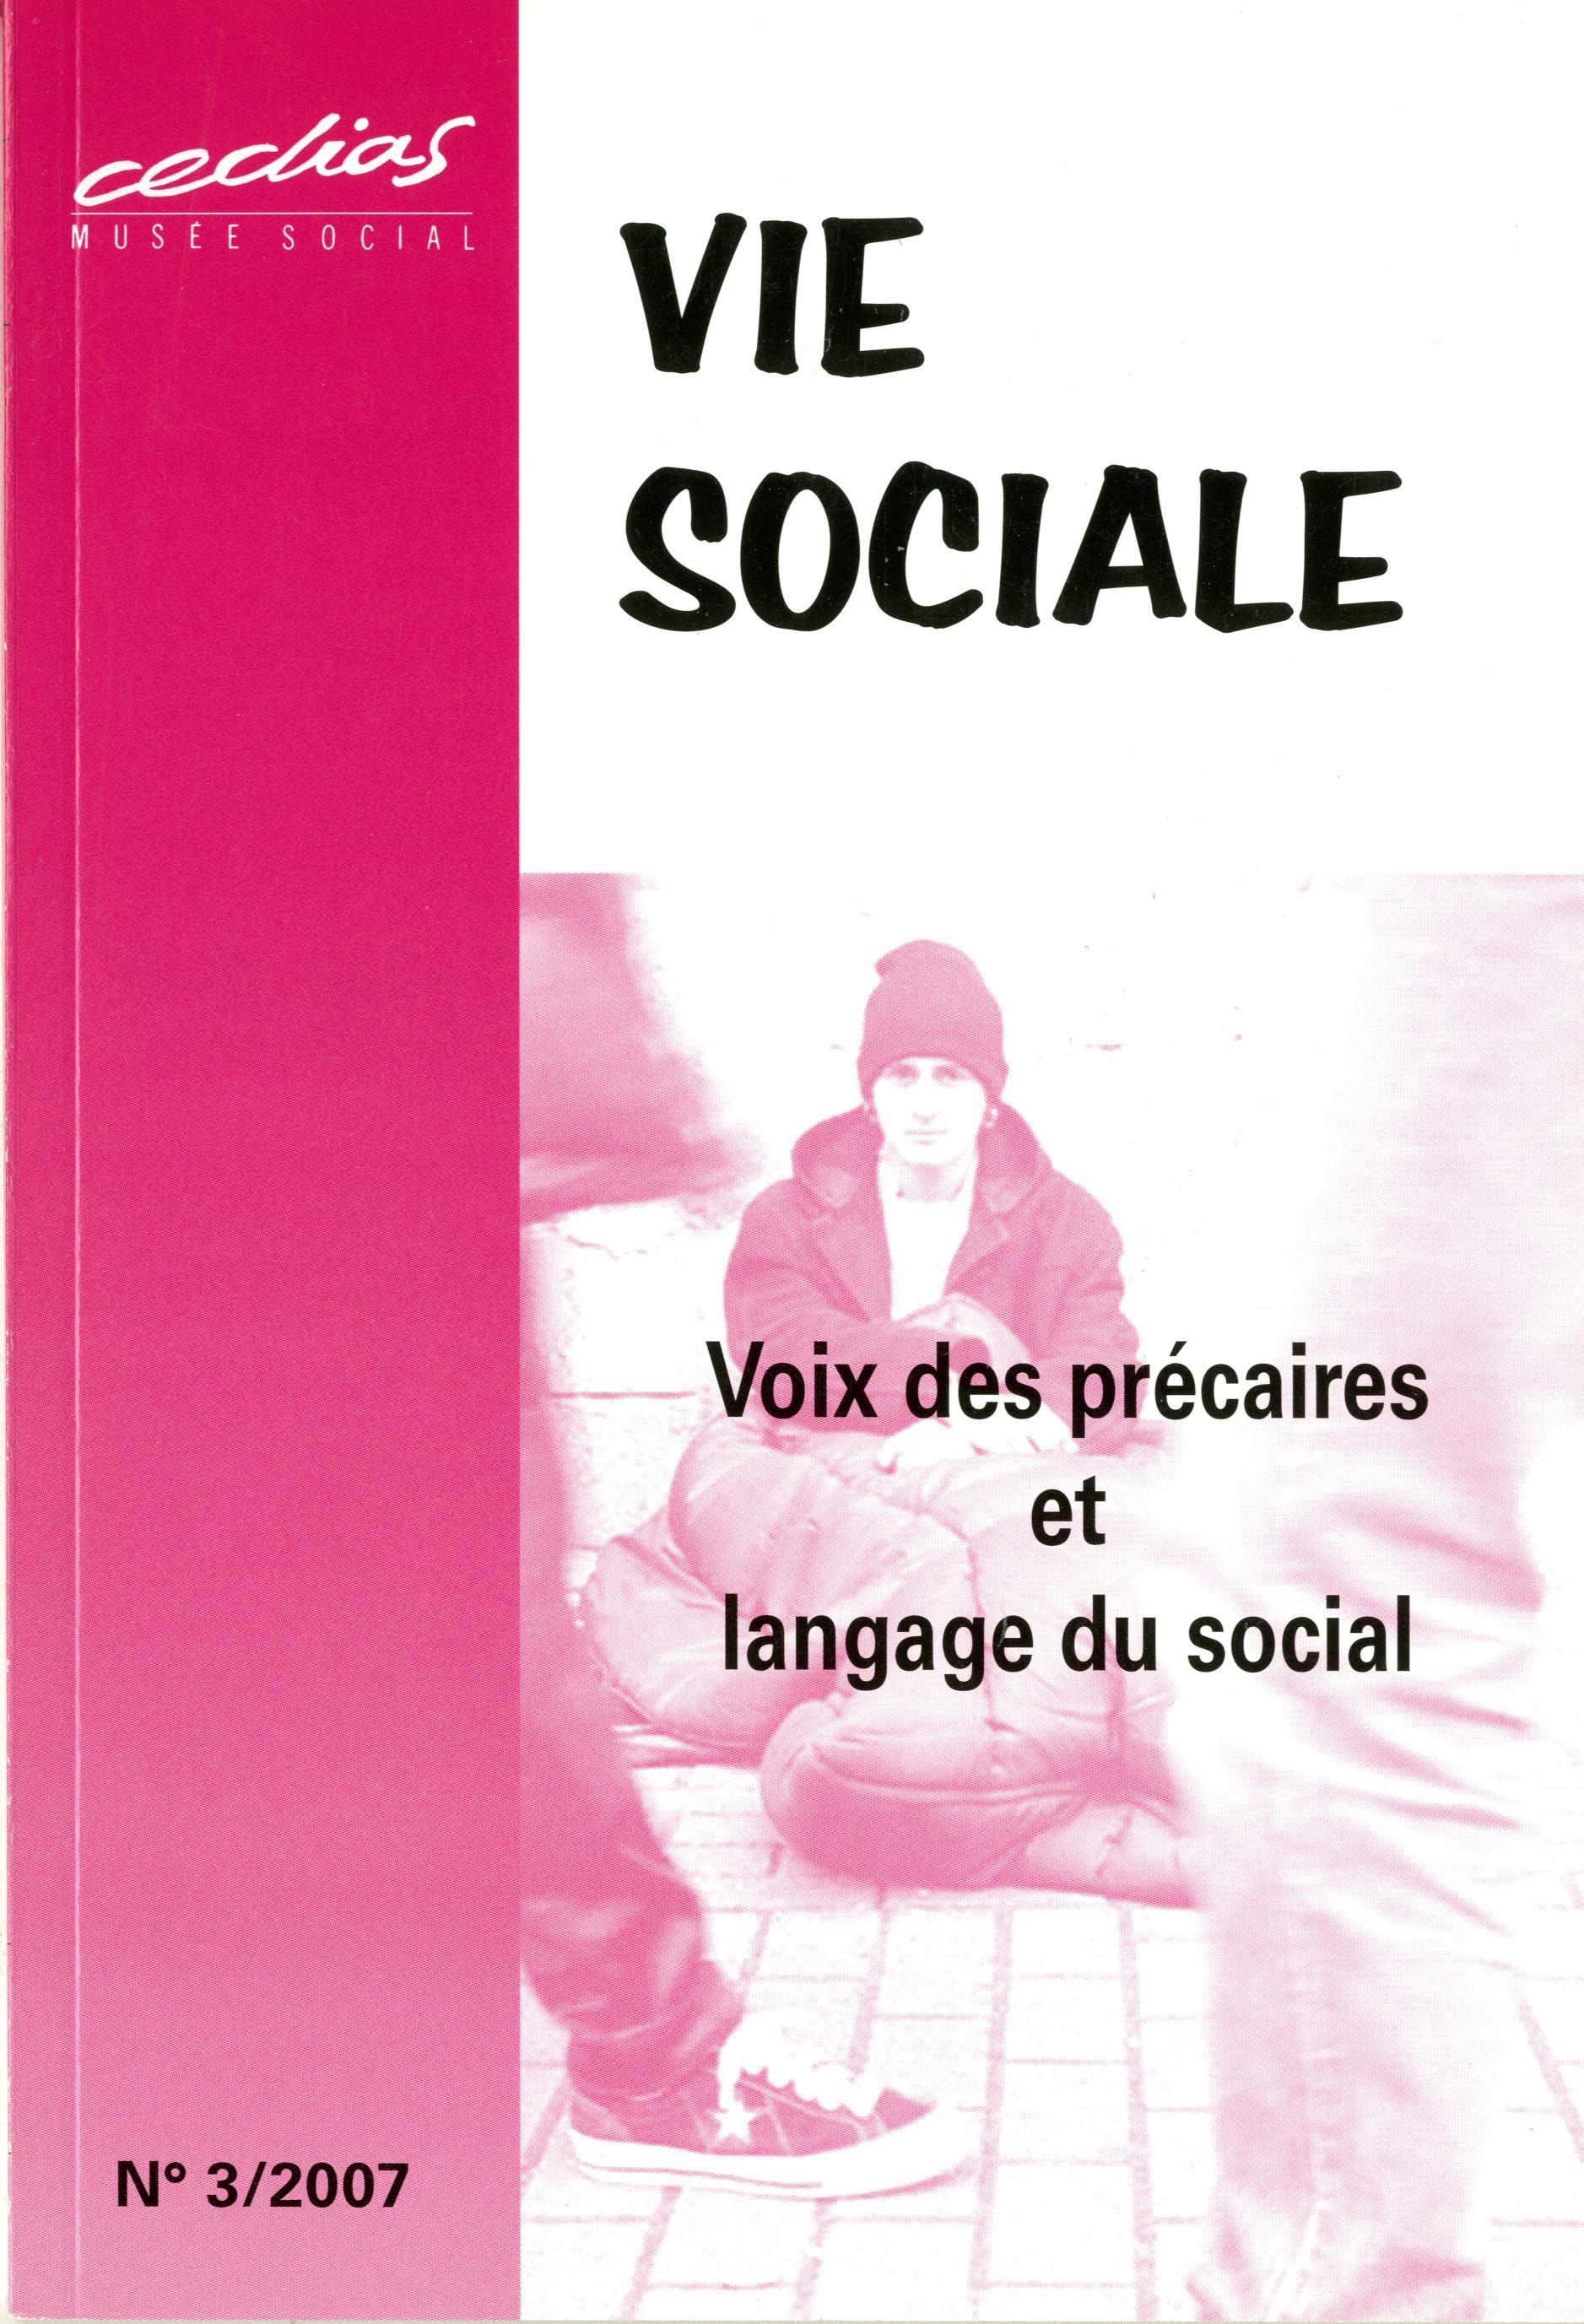 site de rencontres www.persons.com